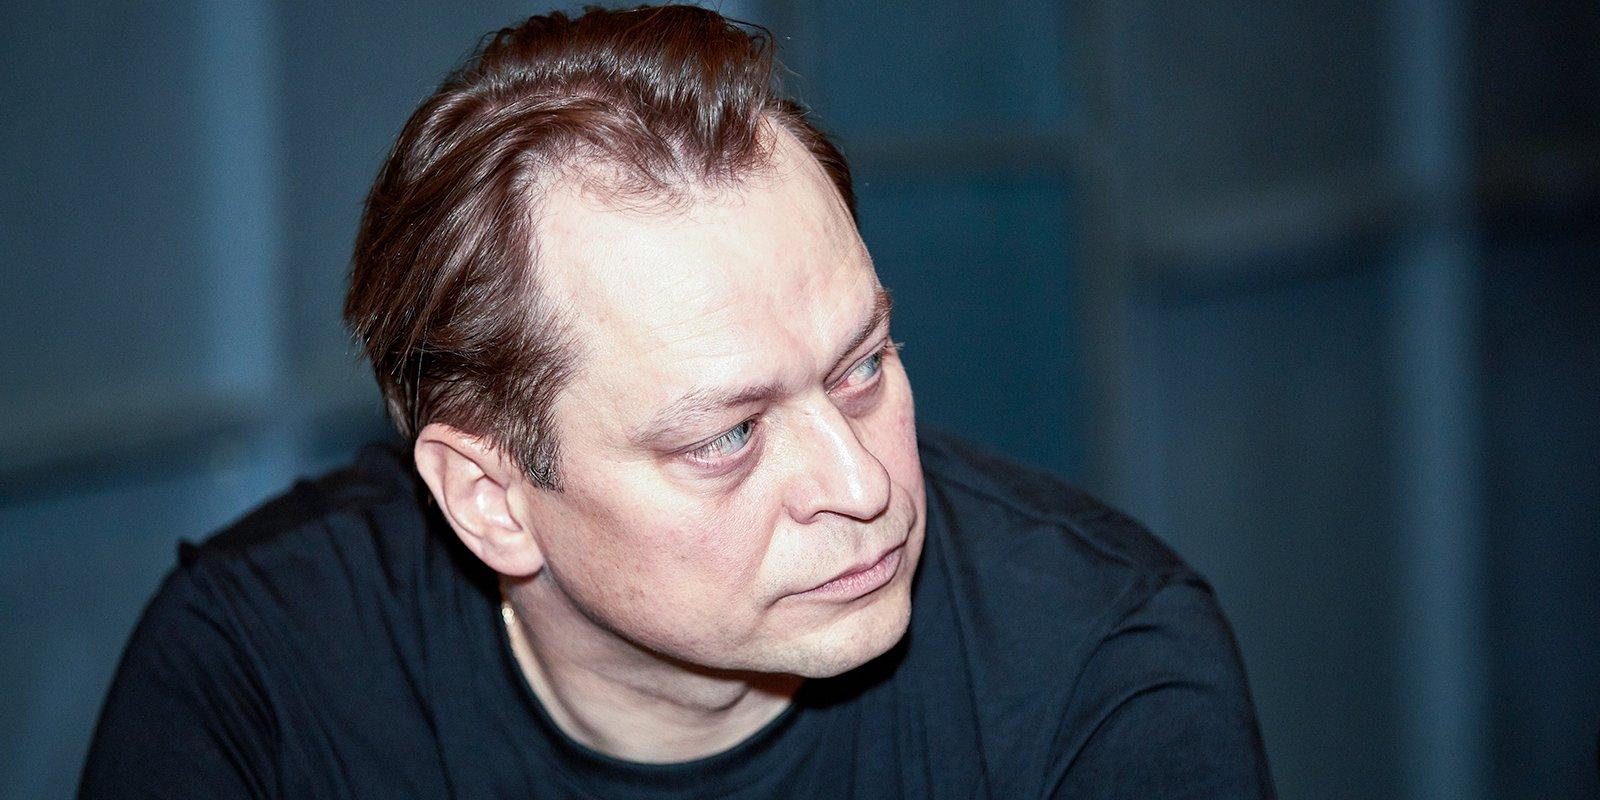 Анатолий Кот, актер театра и кино